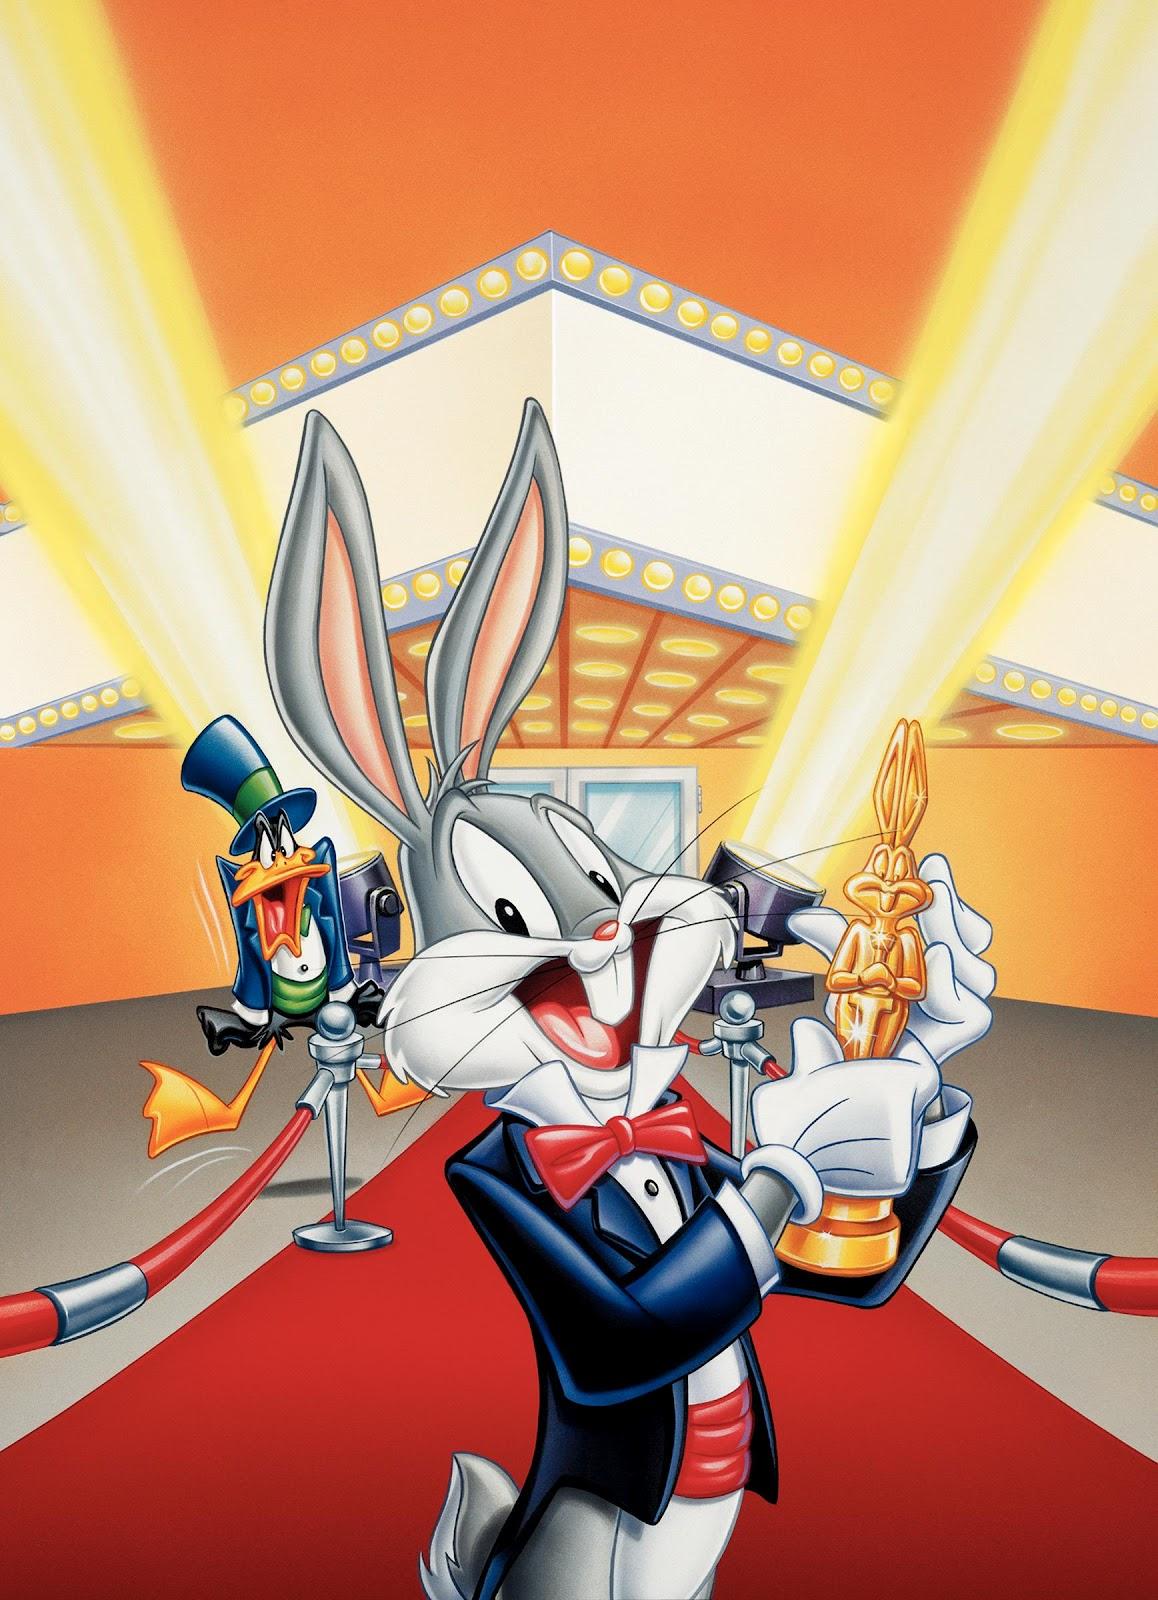 Bugs Bunny Hd Wallpaper